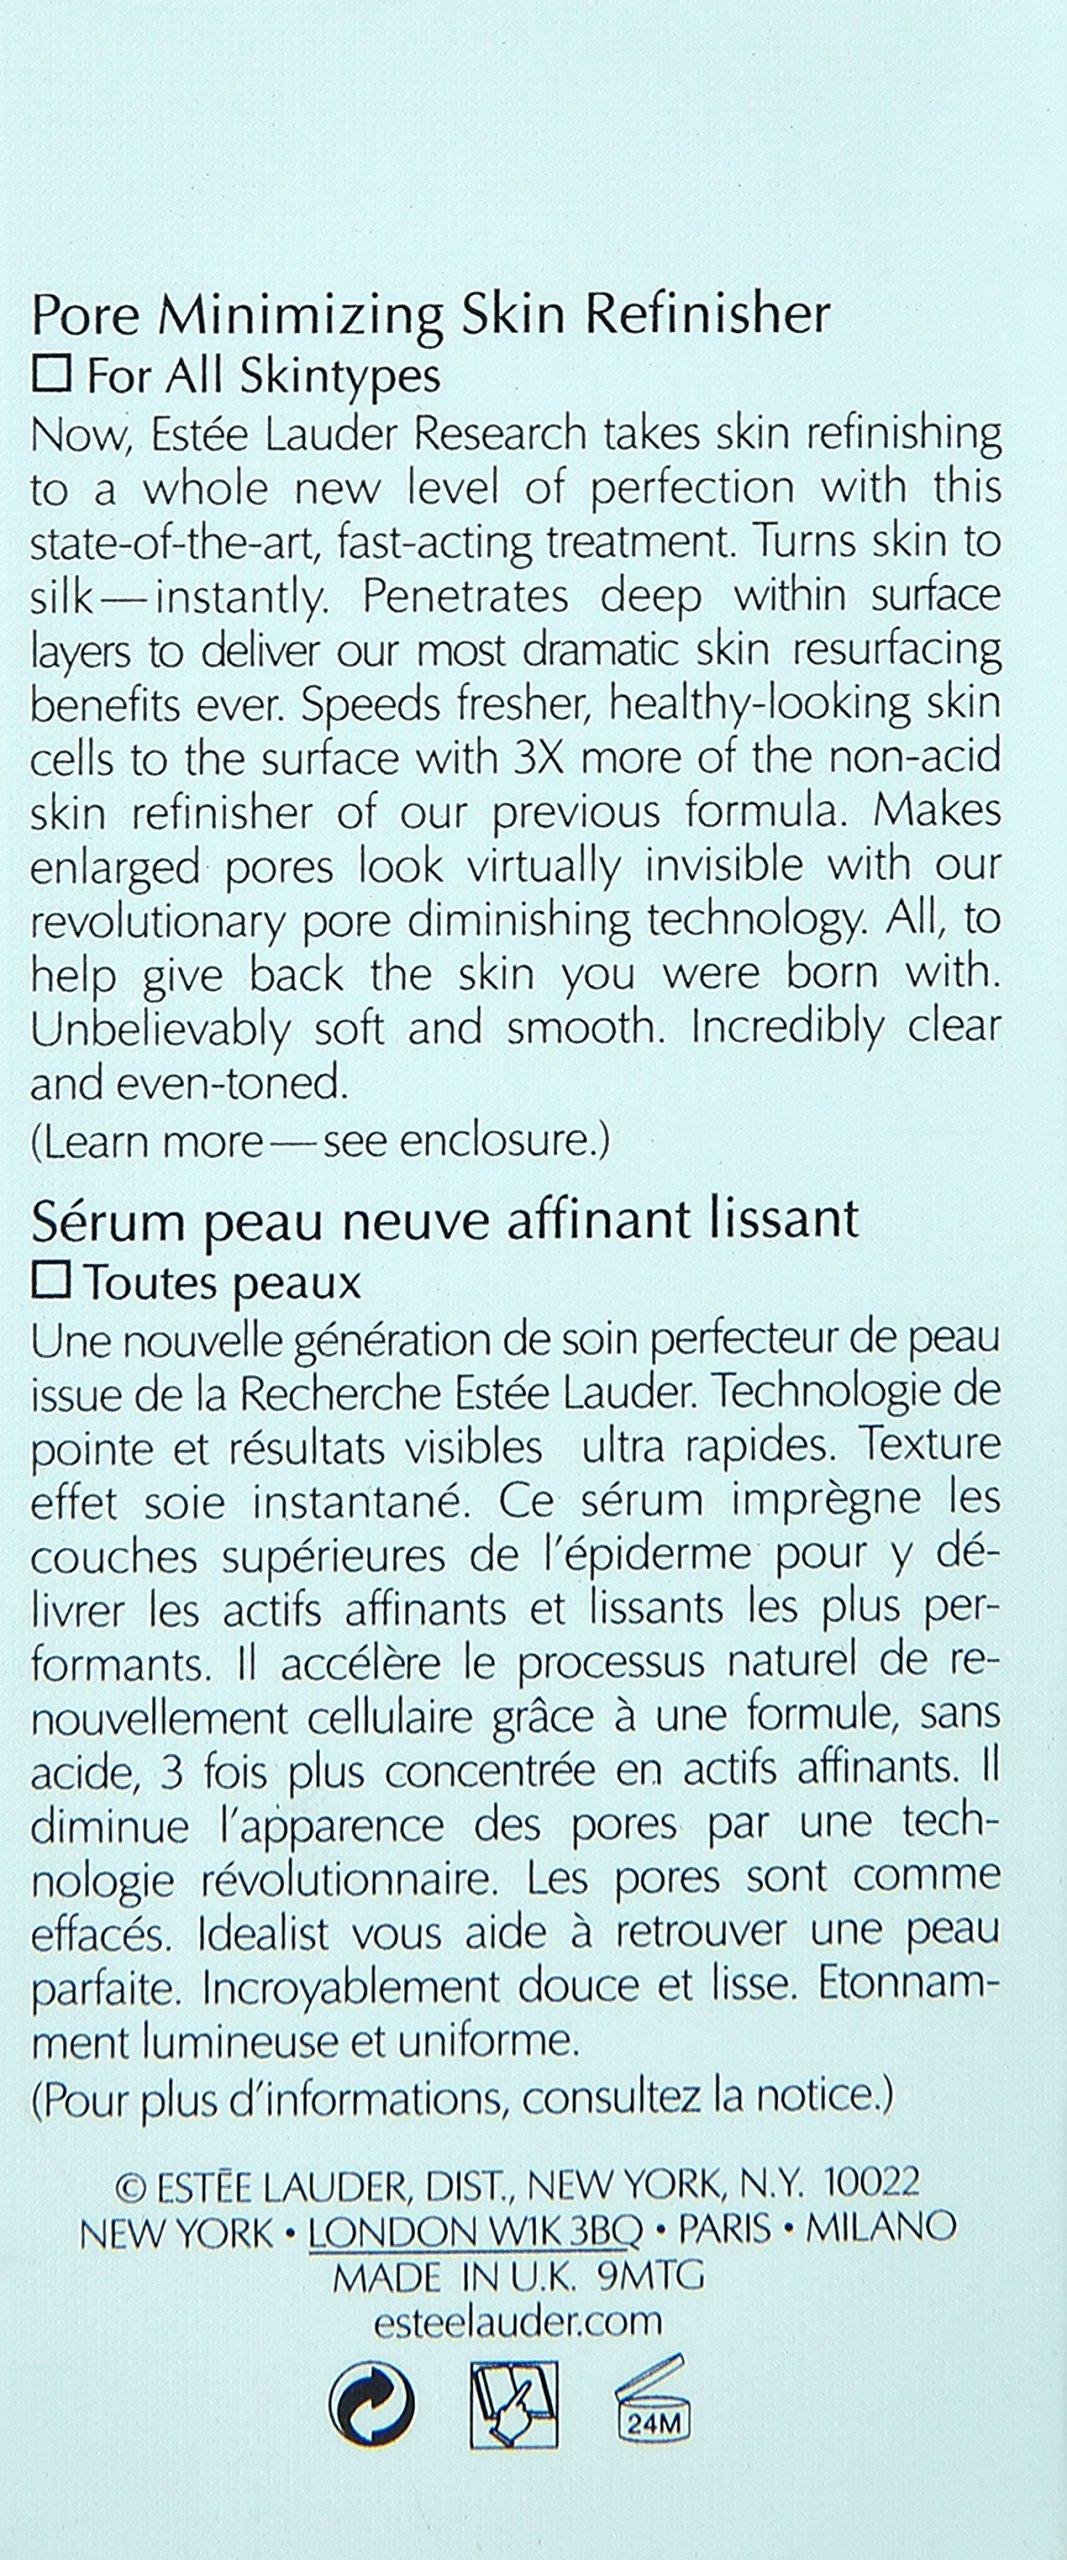 Estee Lauder Idealist Pore Minimizing Skin Refinisher, 1.7 Ounce by Estee Lauder (Image #2)